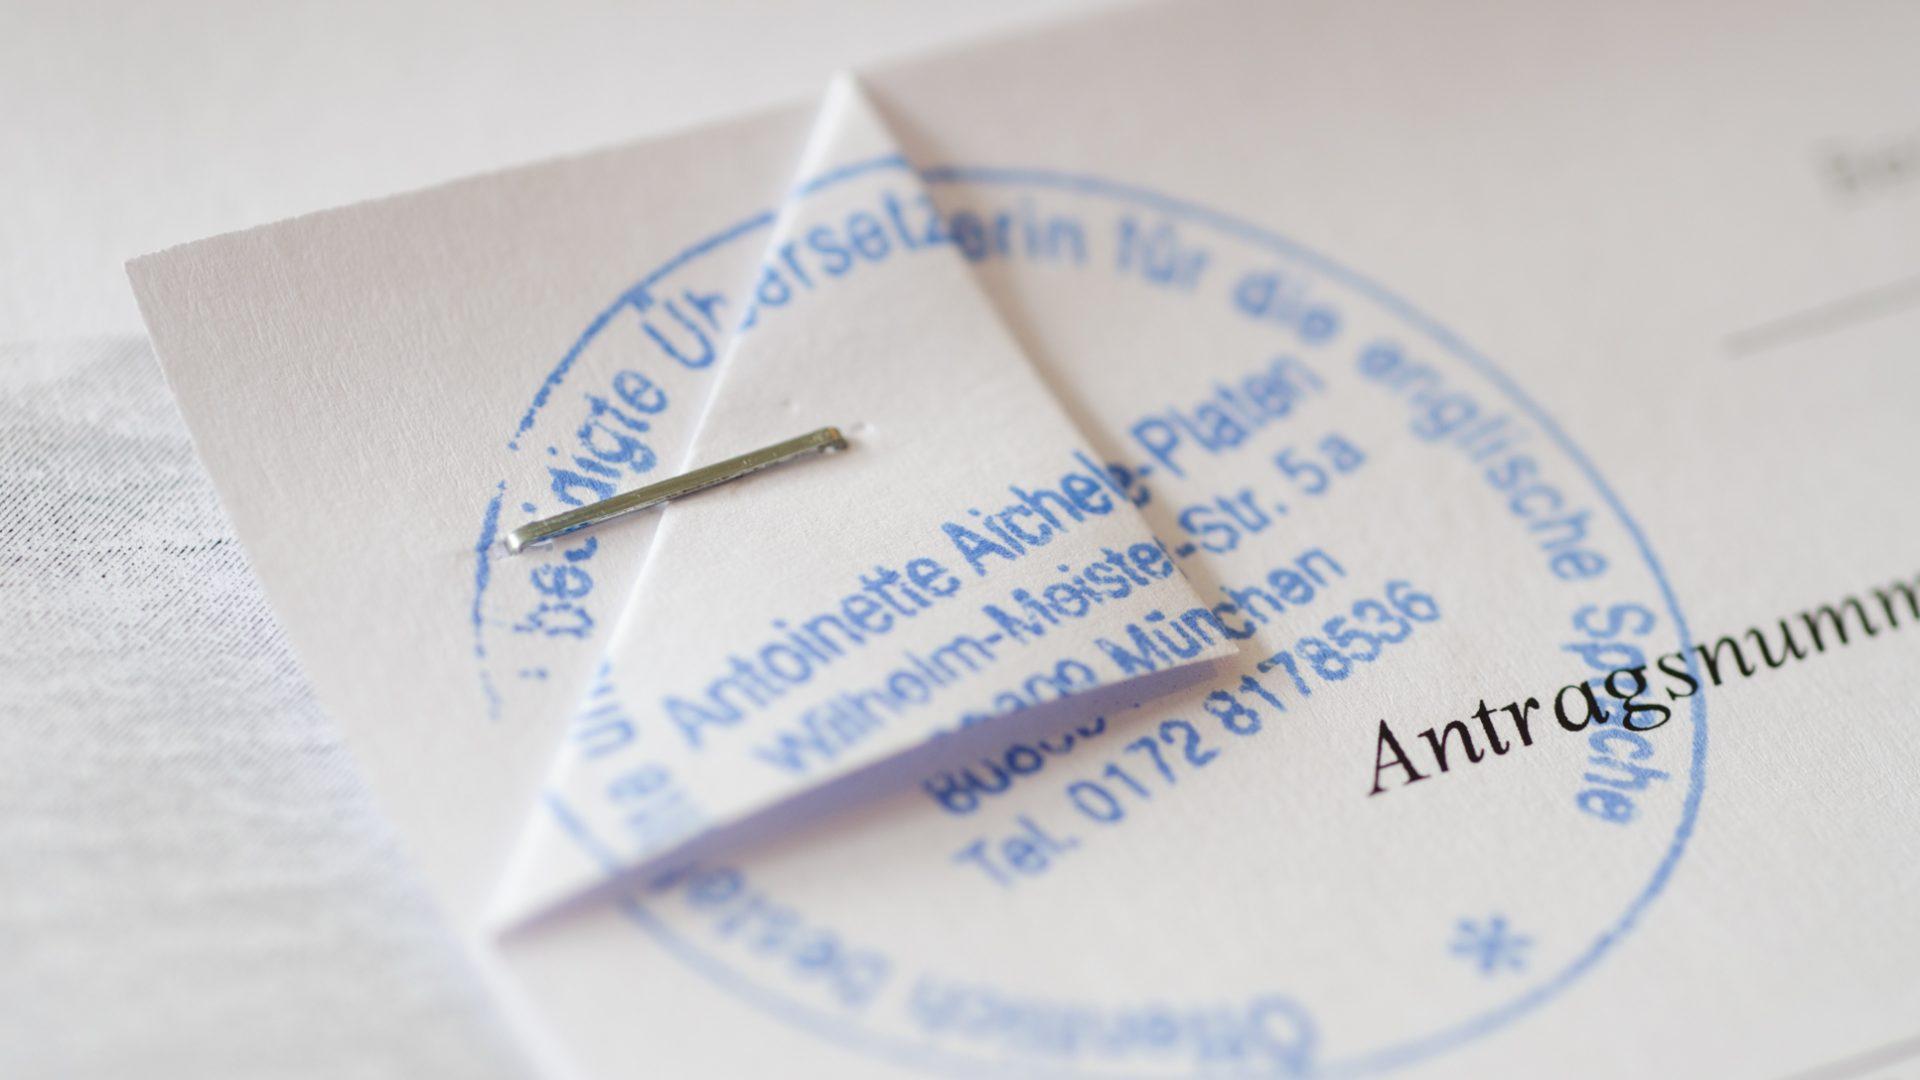 Übersetzungsbüro | Translation Agency Antoinette Aichele-Platen